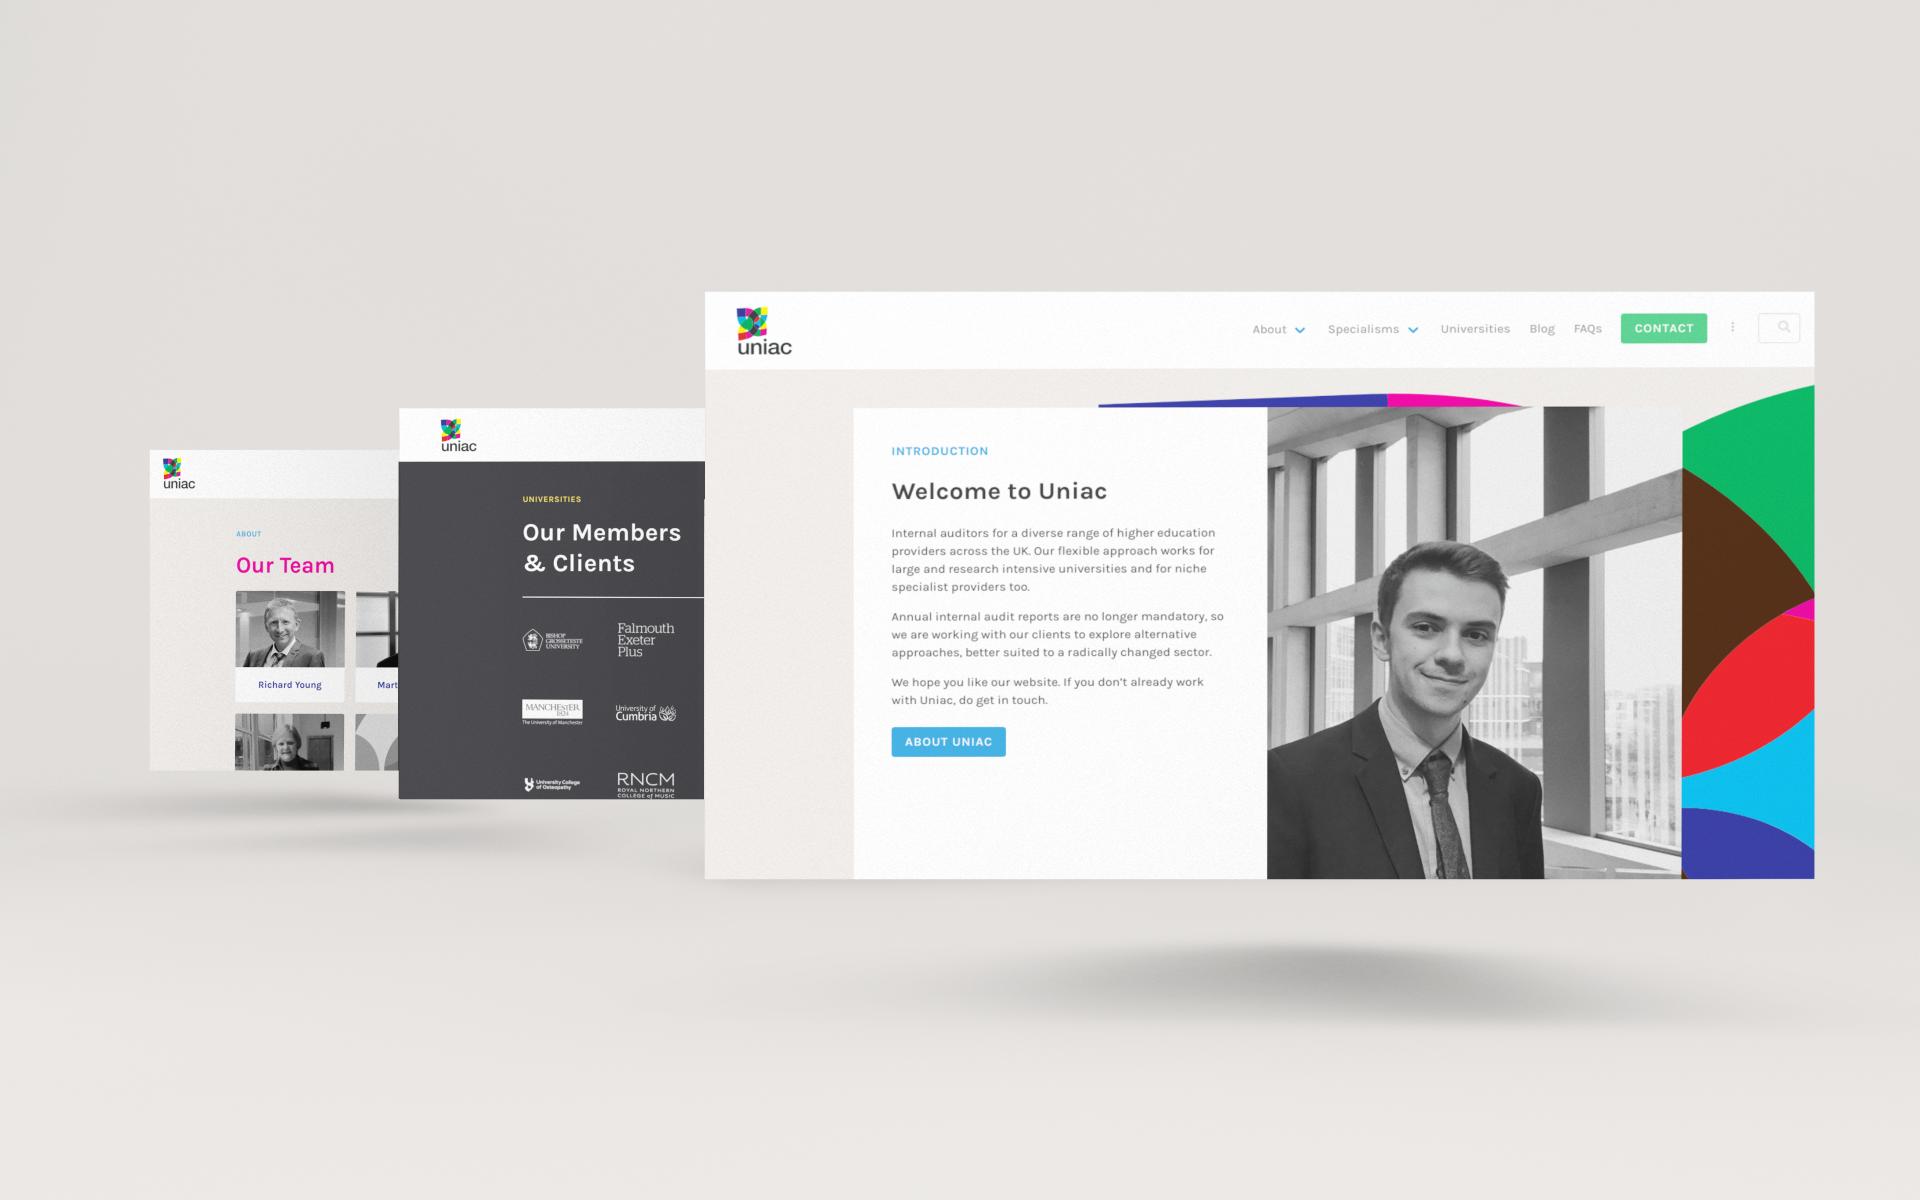 Uniac website design by Sunny Thinking